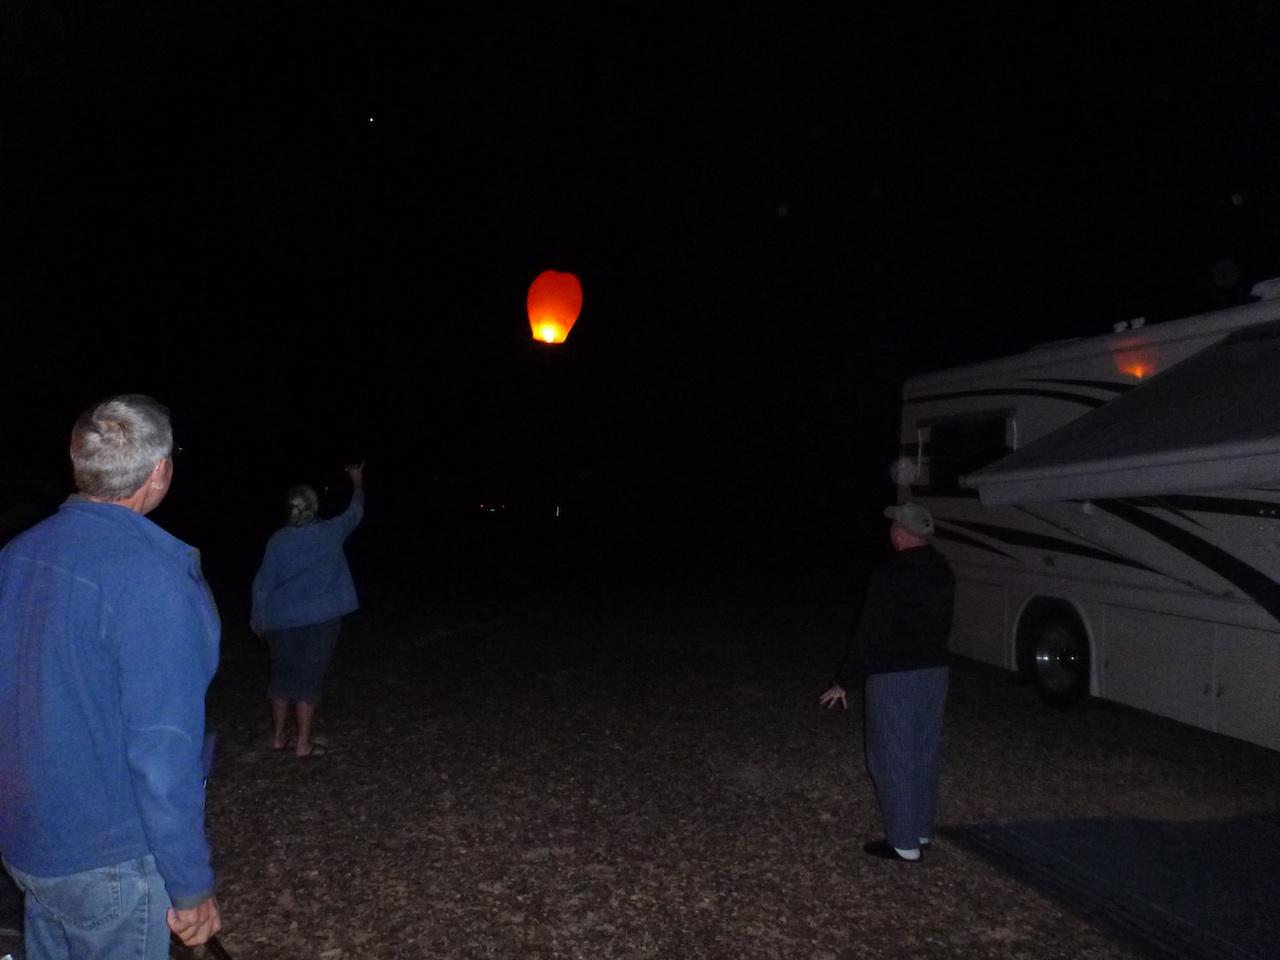 The Sky Lantern Floating Away